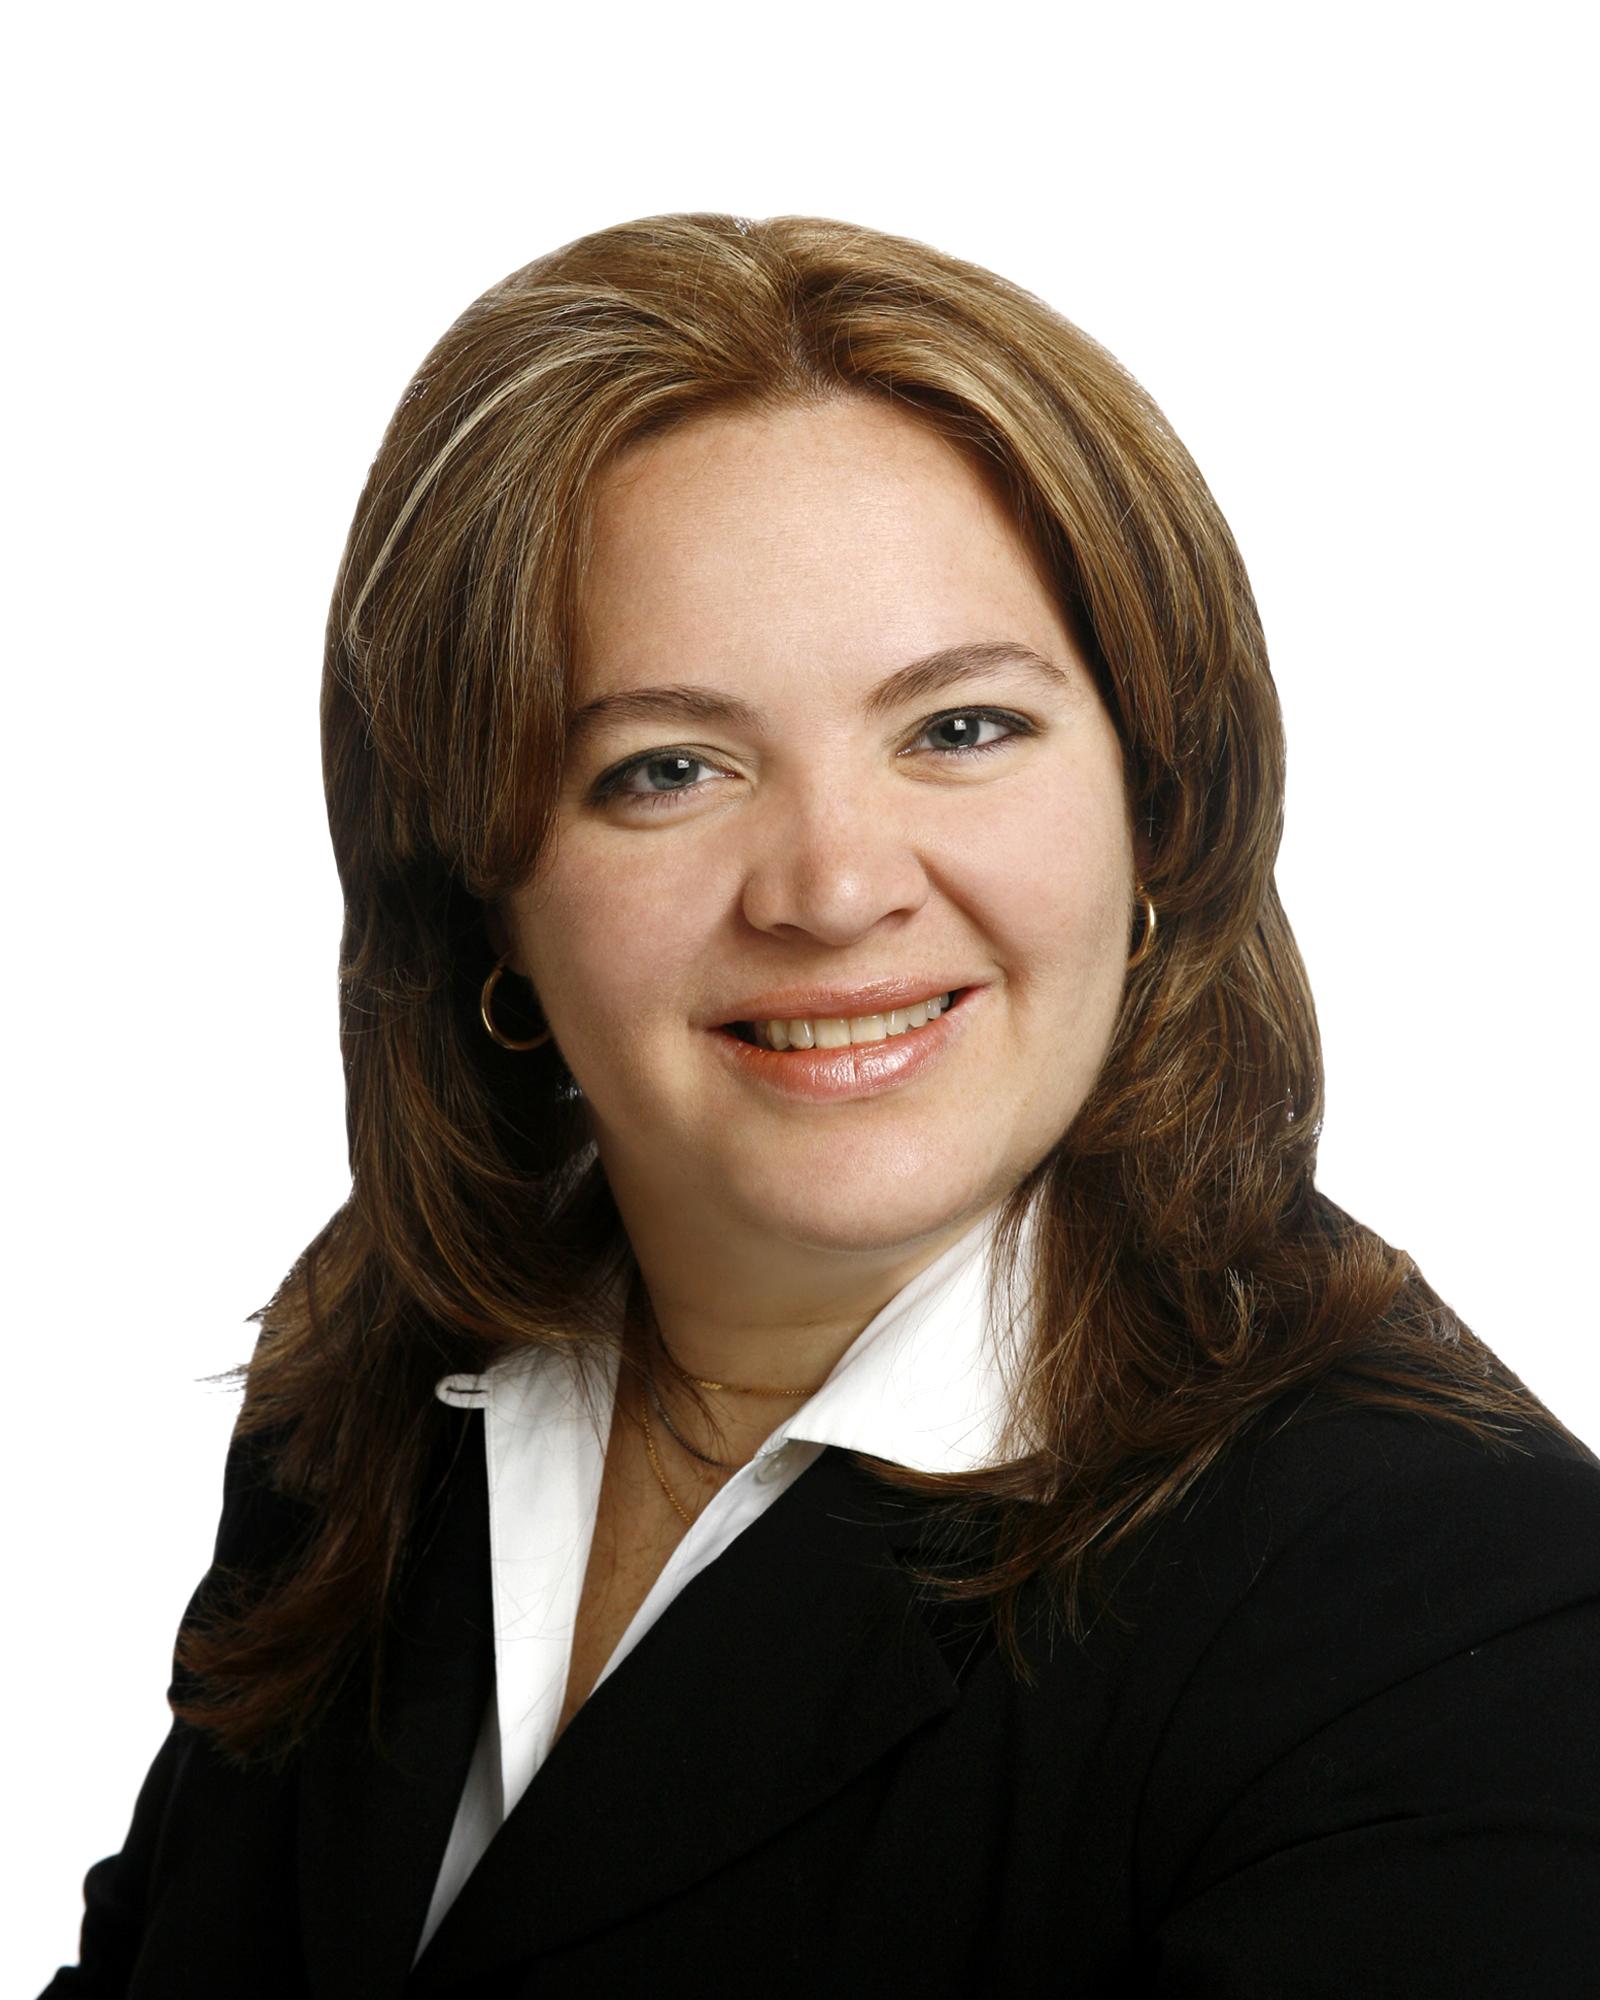 Angie Pineiro